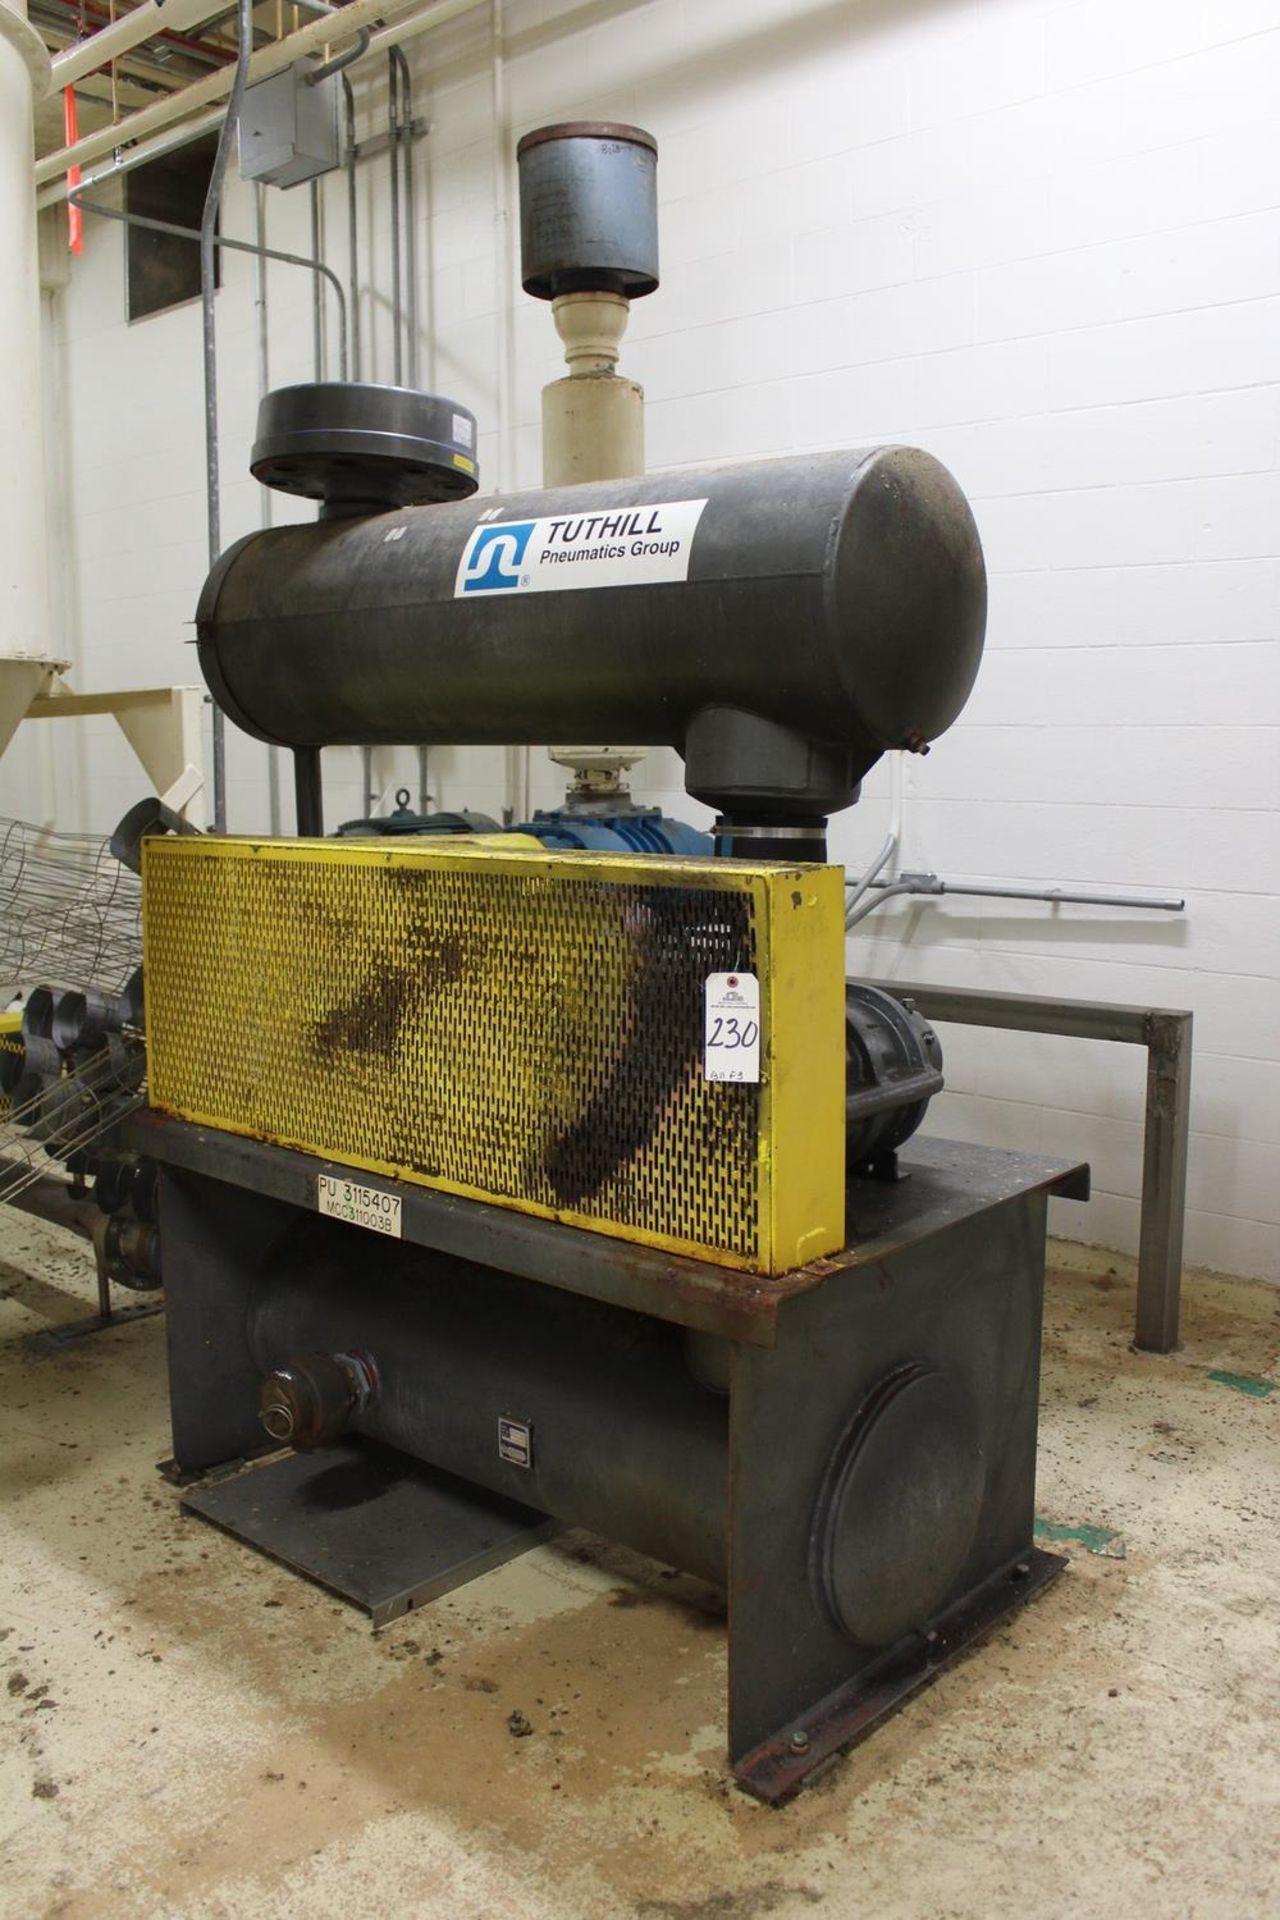 Lot 230 - 25 HP Blower | Rig Fee: $350